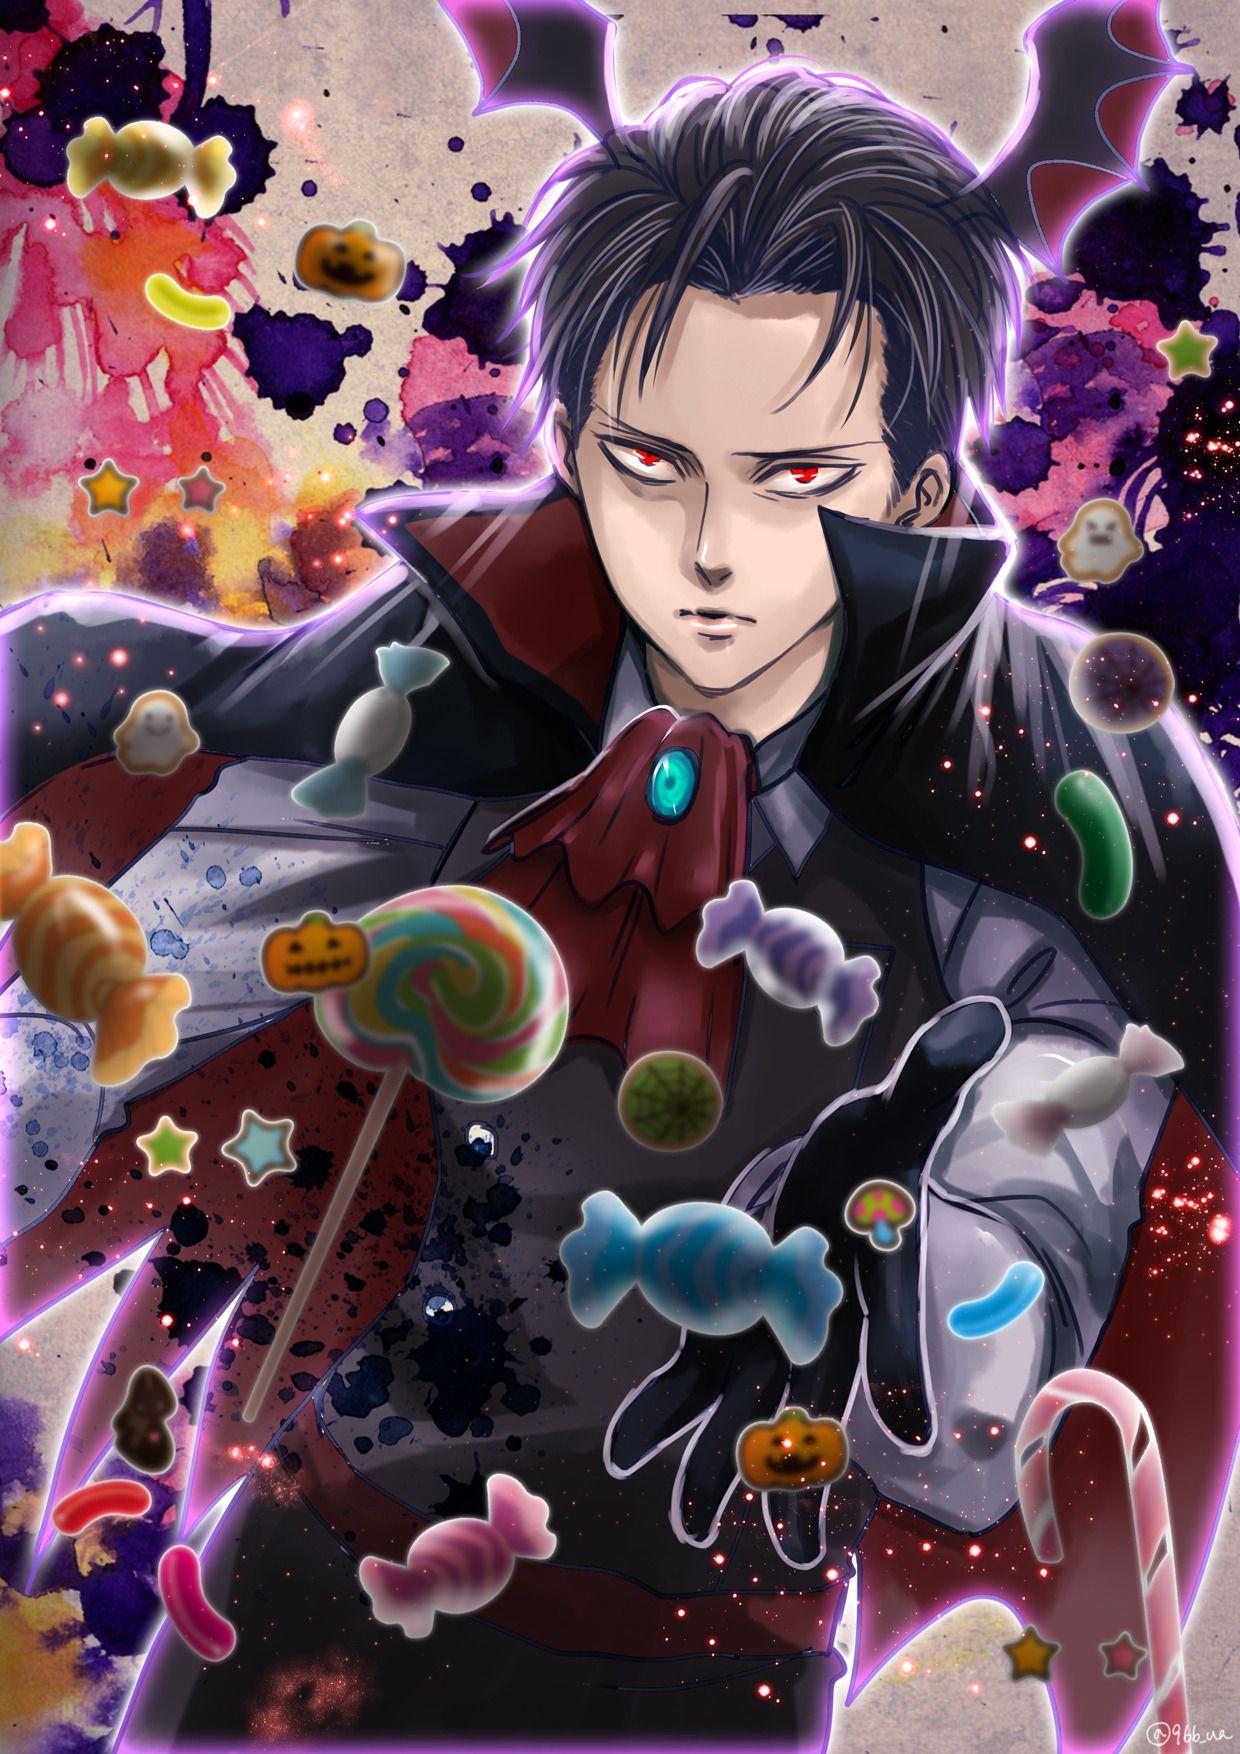 966 Ua Vampire Heichou Anime Attack On Titan Levi Eruri